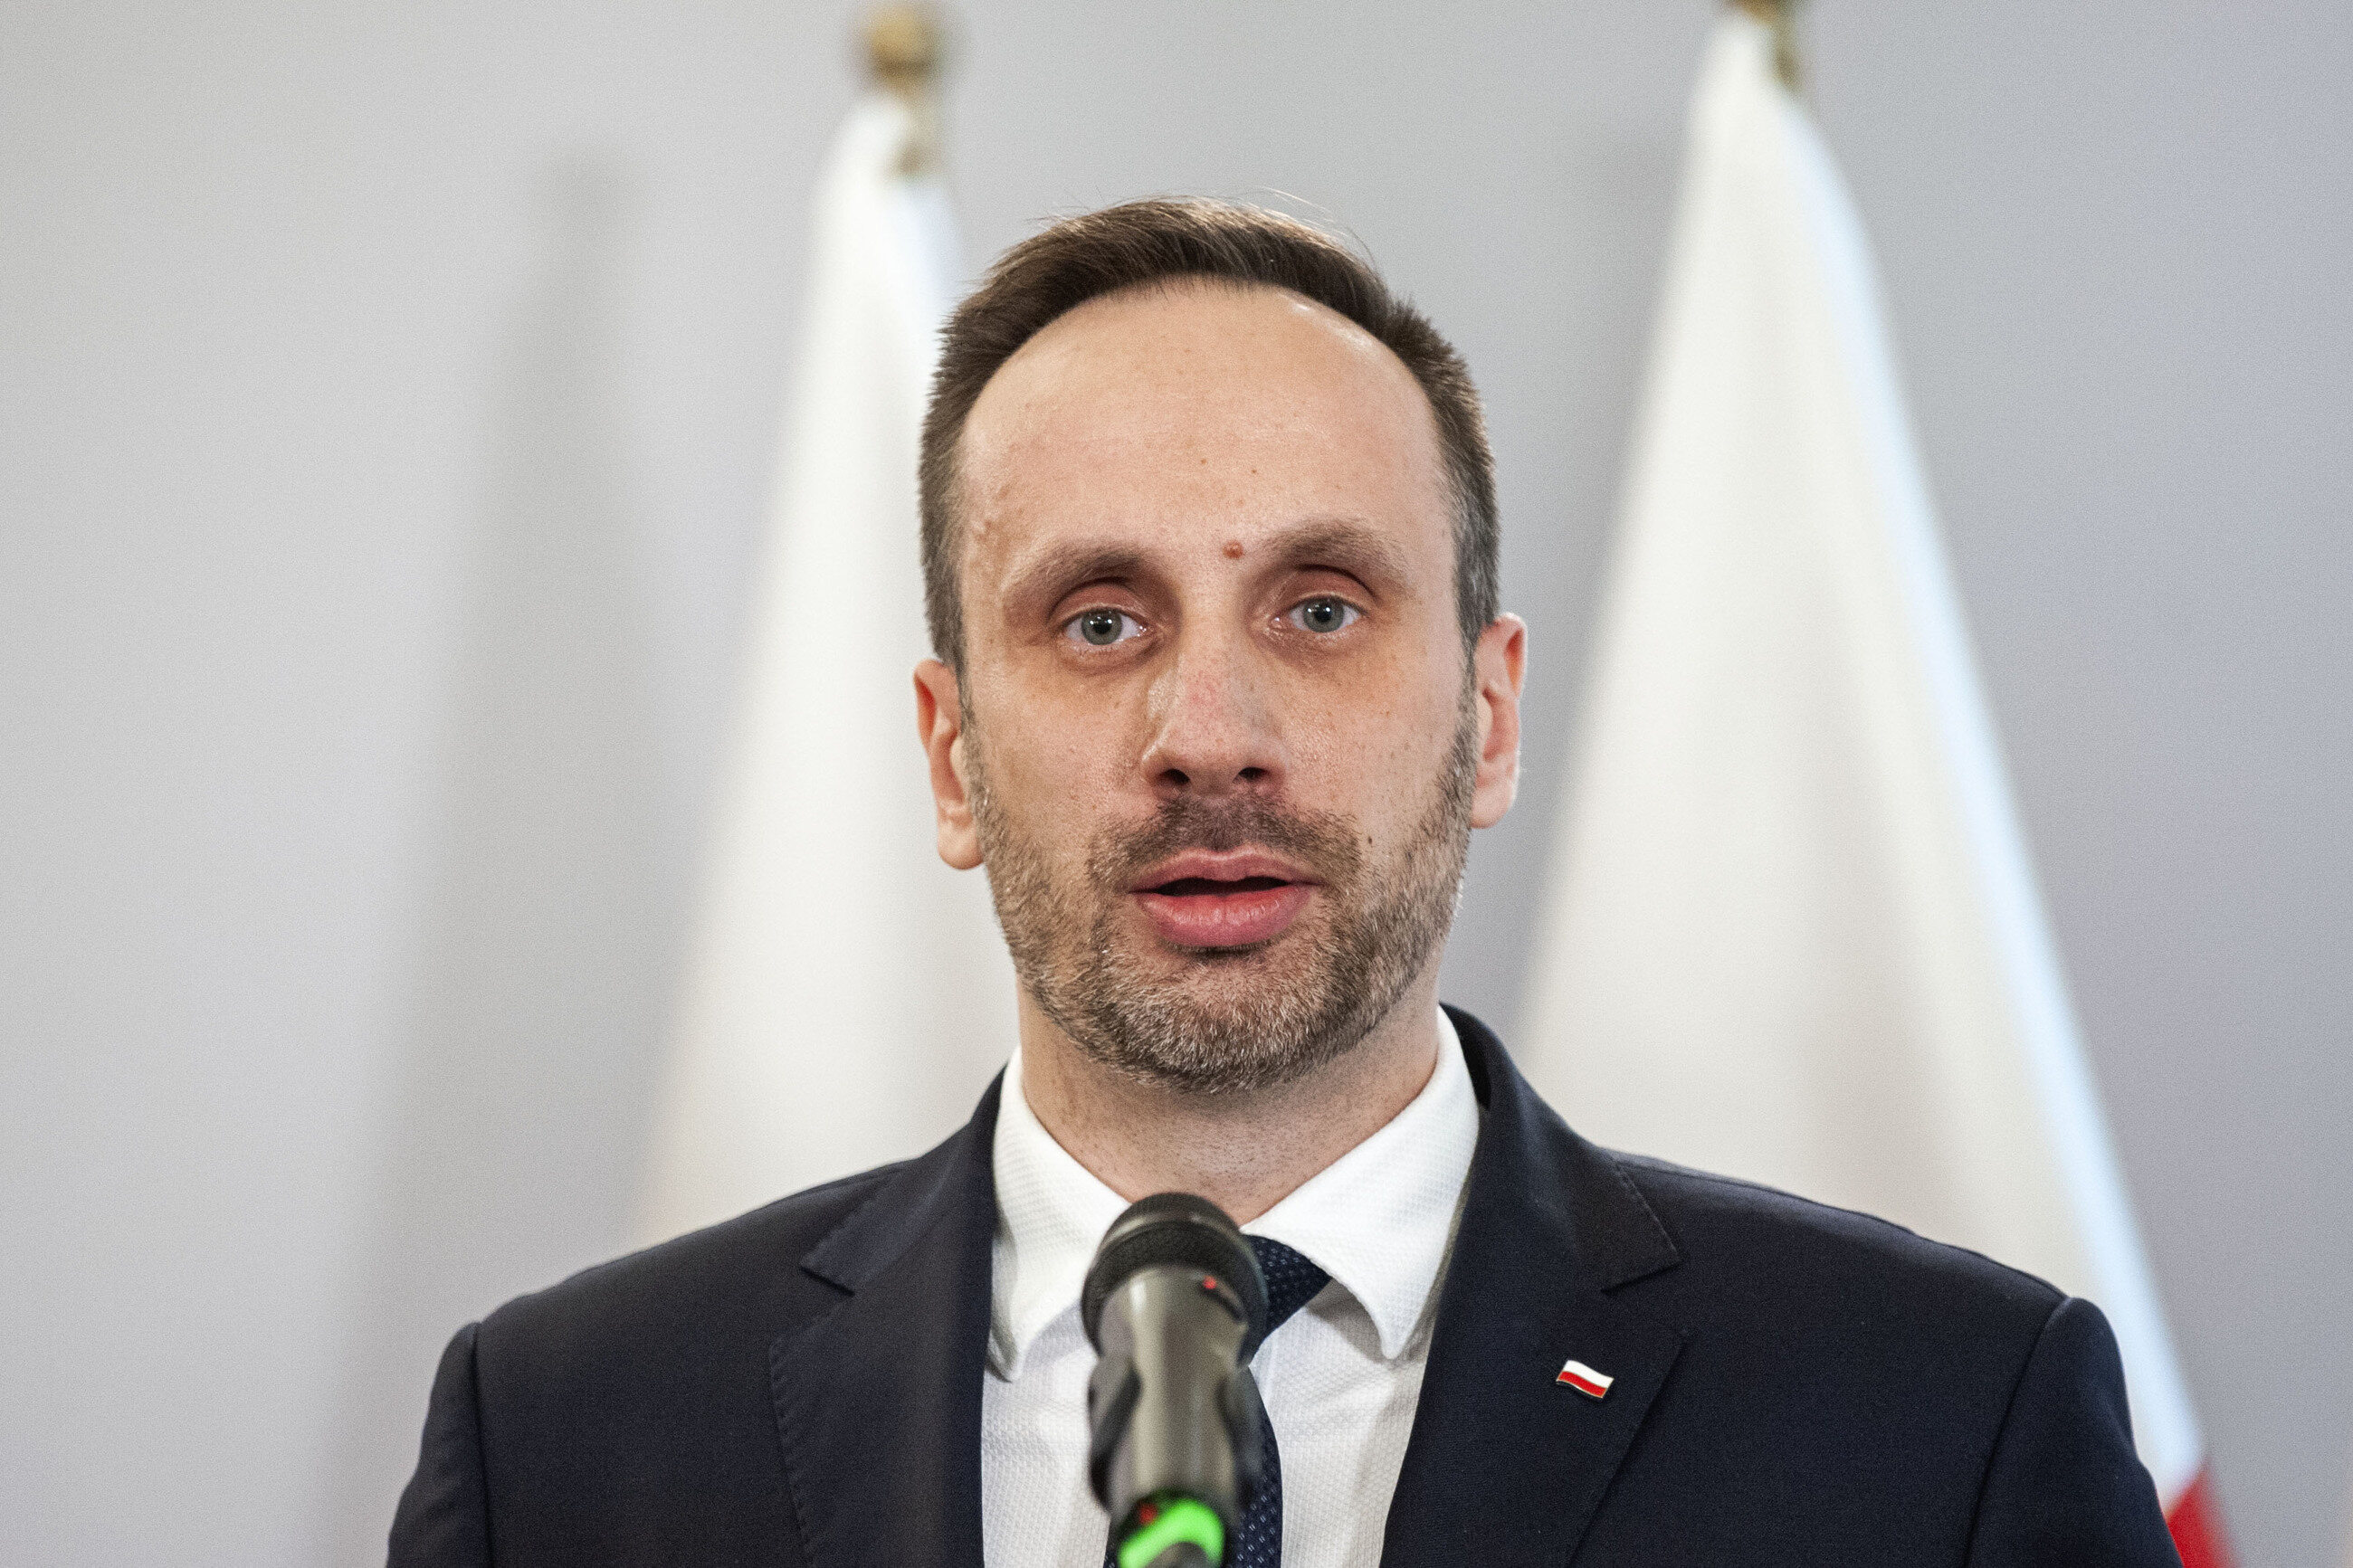 Janusz Kowalski